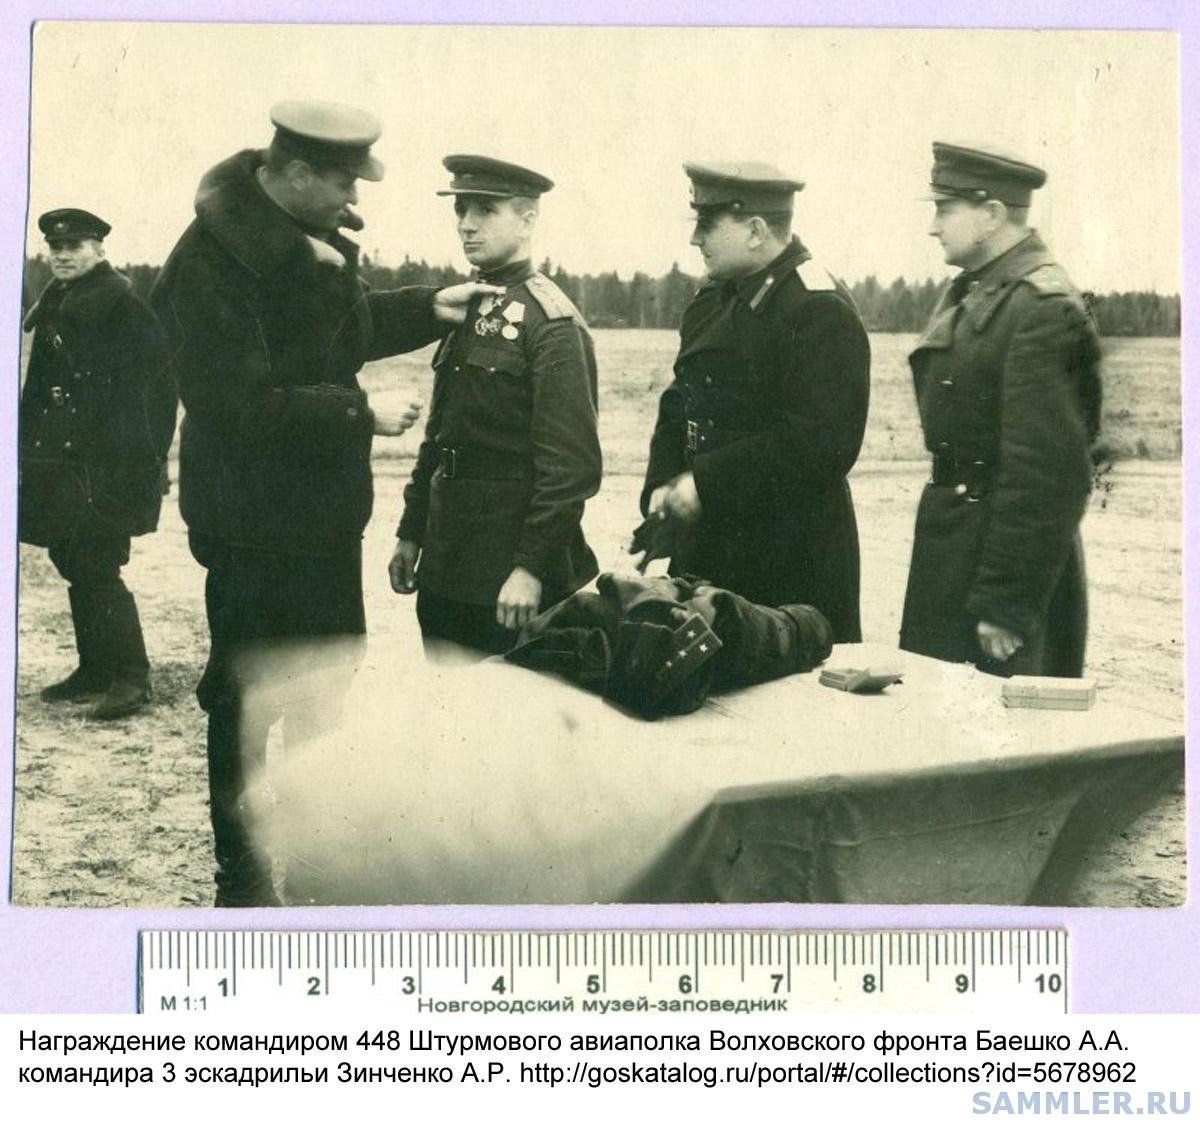 1Zinchenko1944(3).jpg